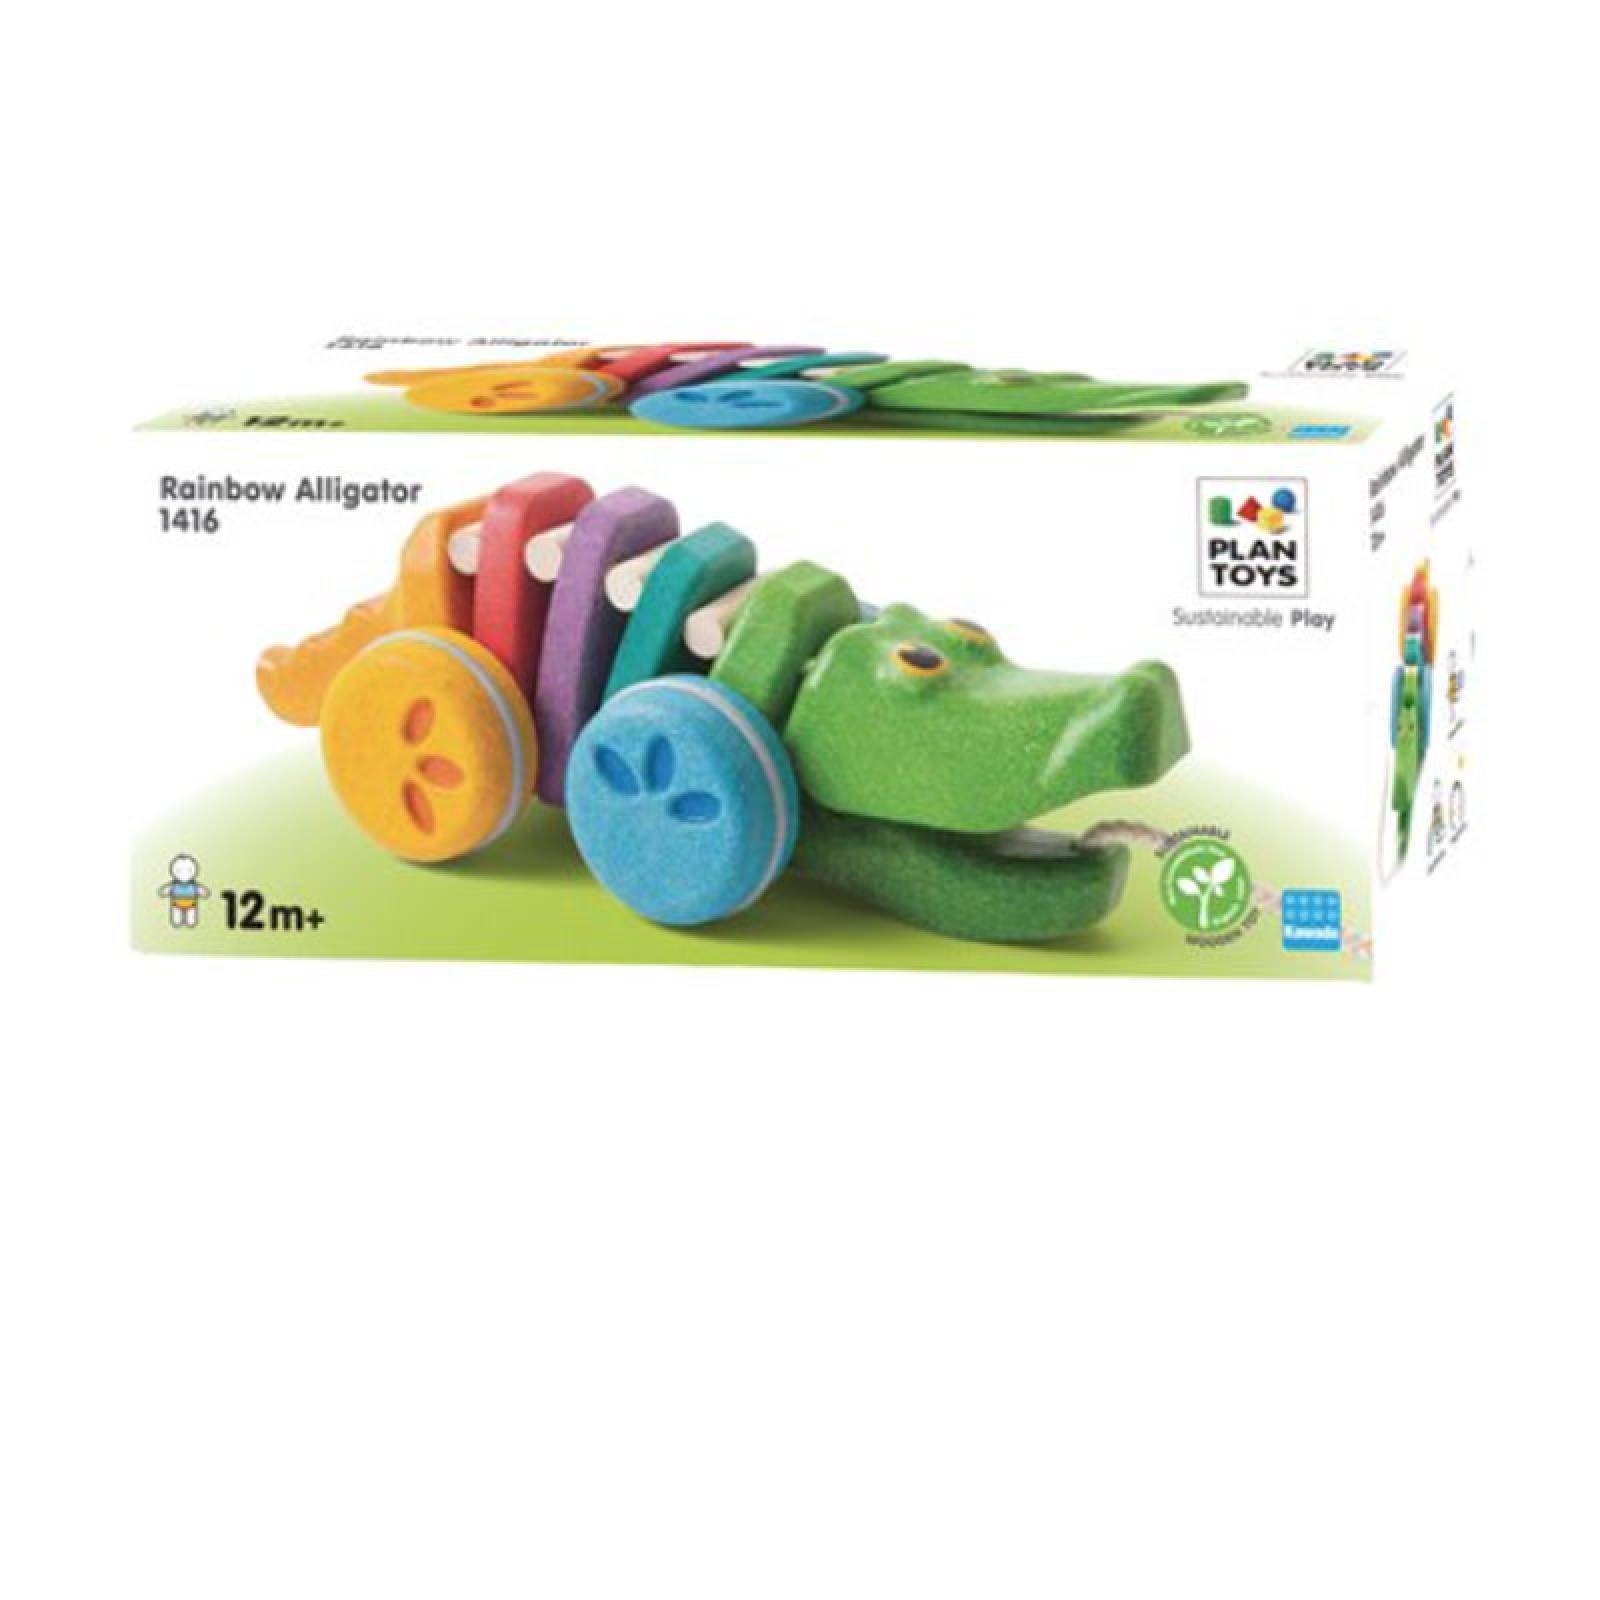 Pull Along Dancing Alligator Rainbow 12m+ Plan Toys thumbnails